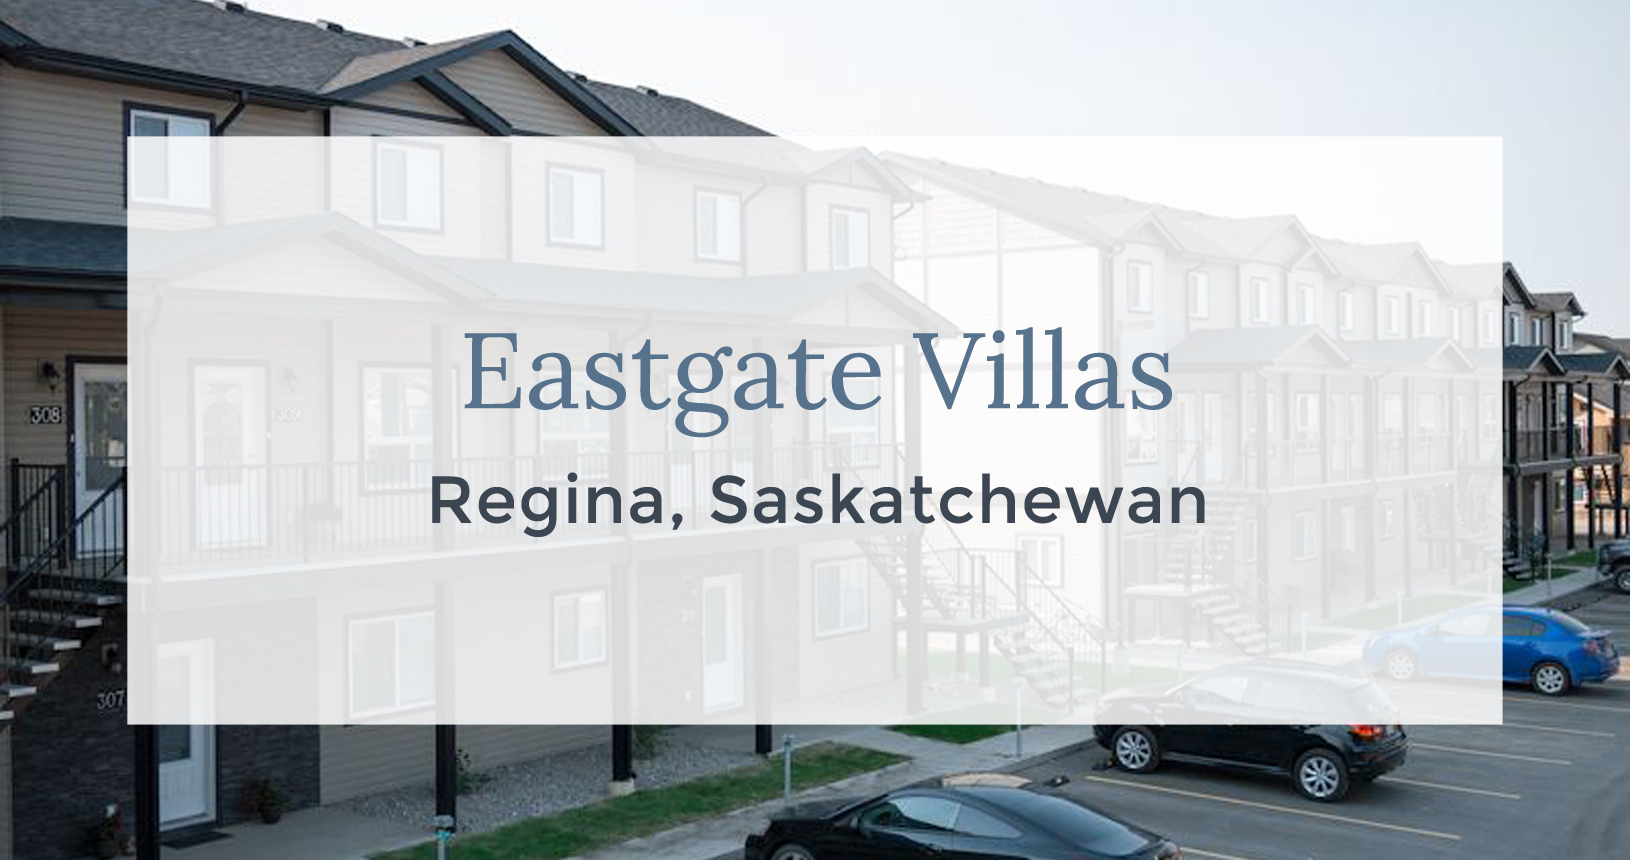 Eastgate Villas: Regina, Saskatchewan